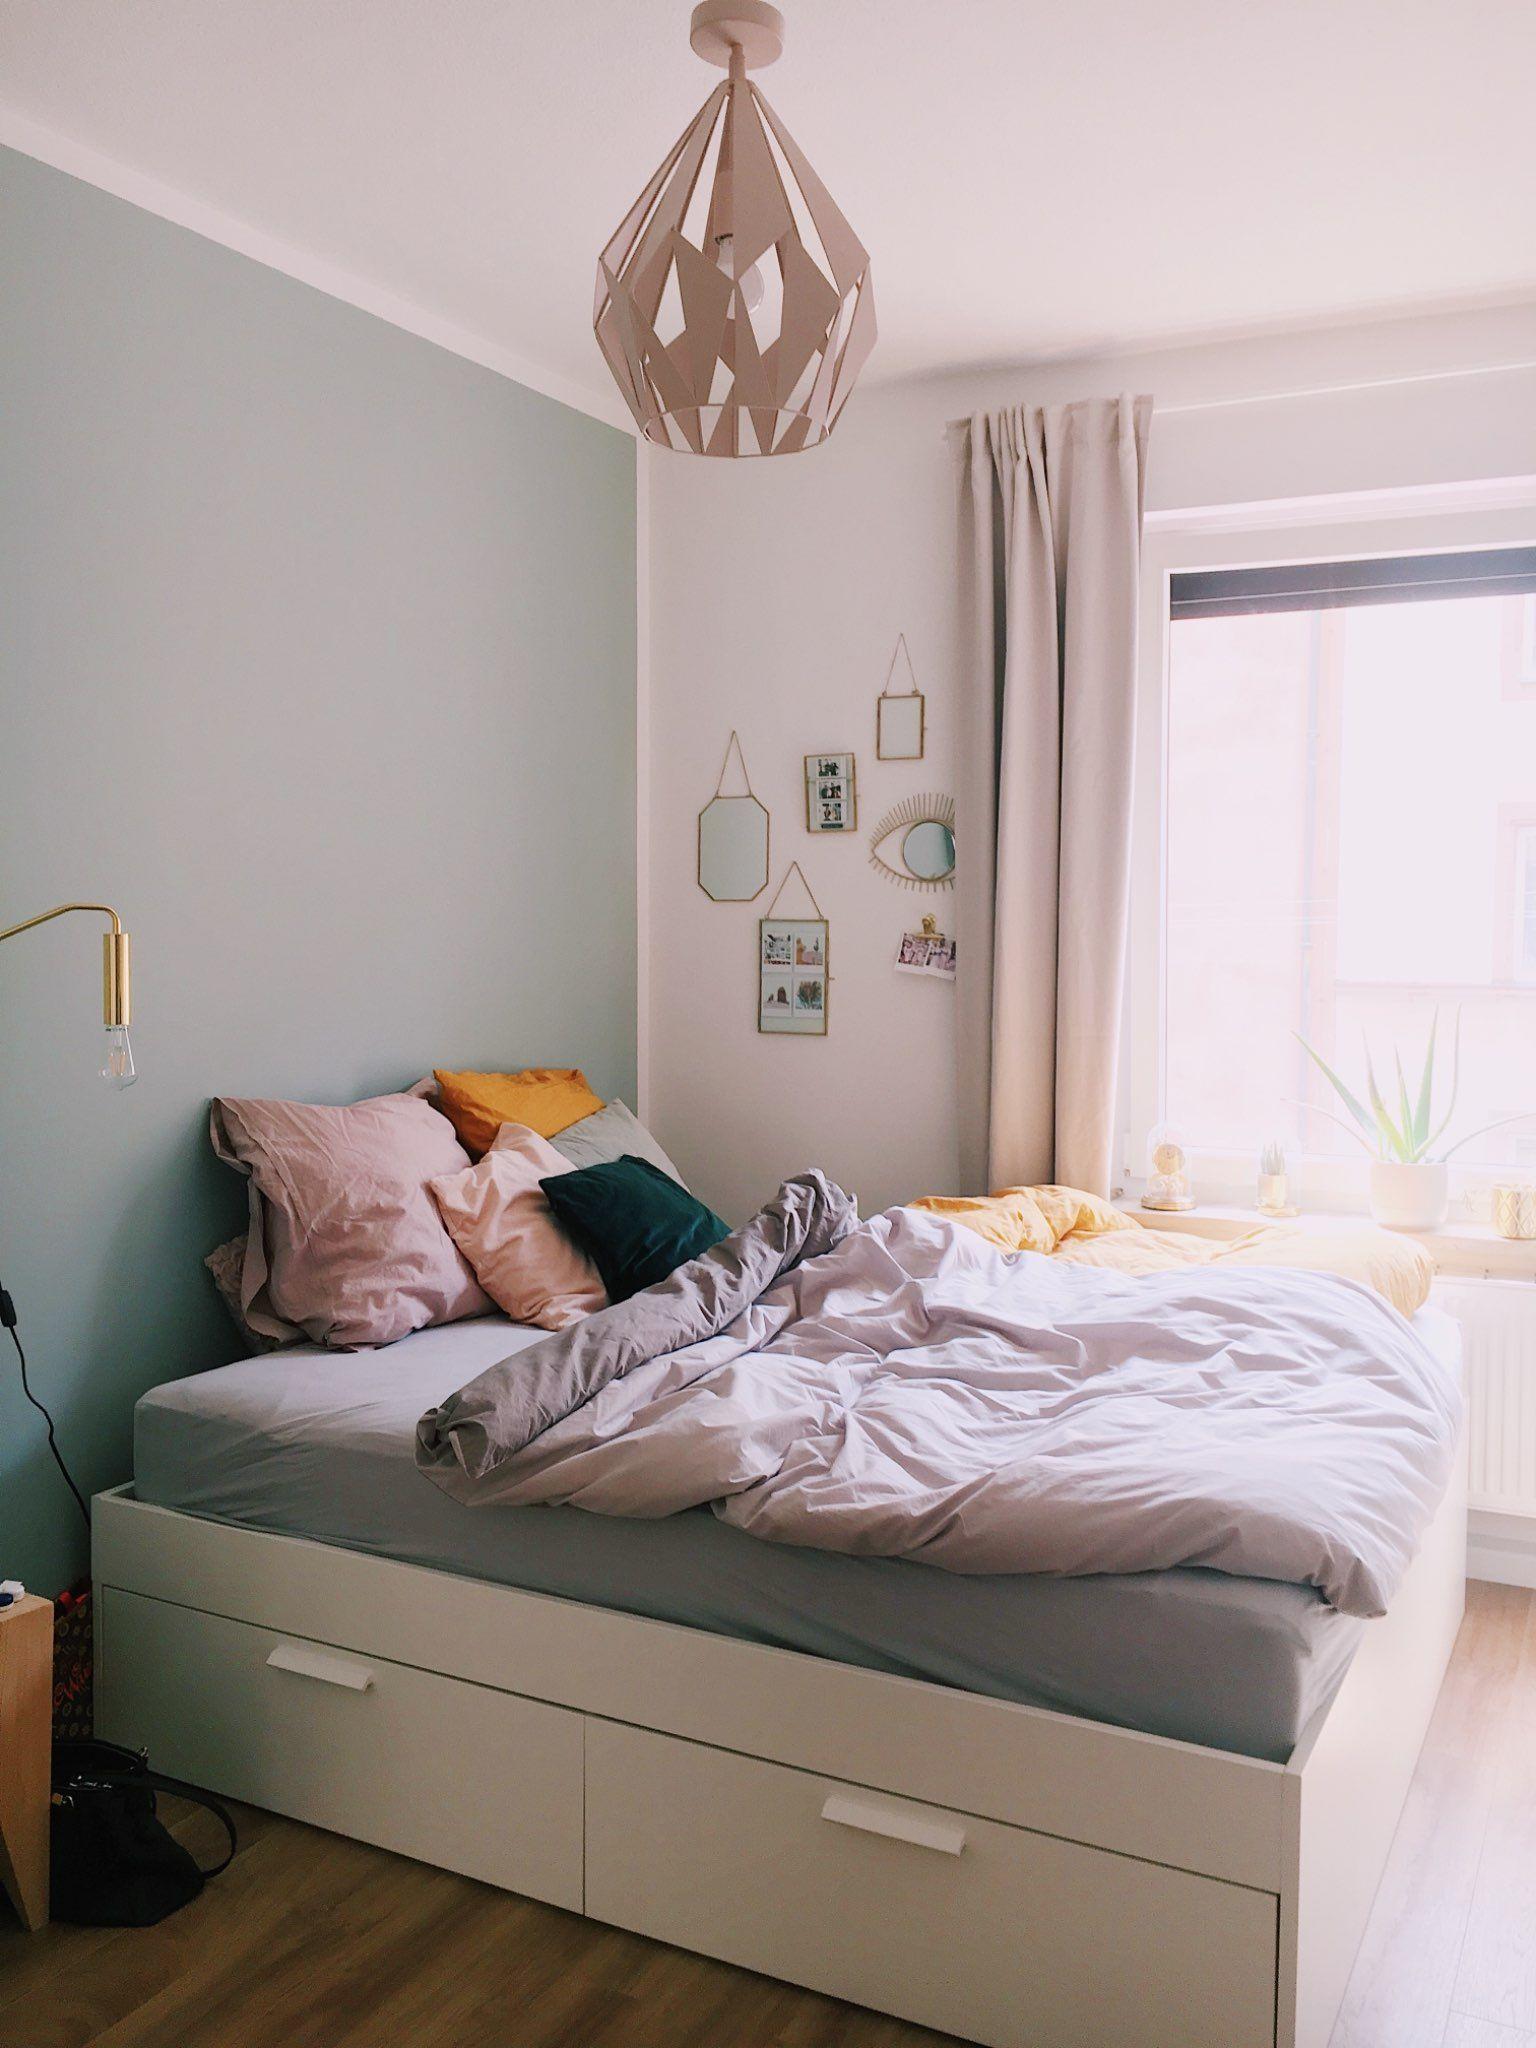 Helles WG-Zimmer in Pasteltönen